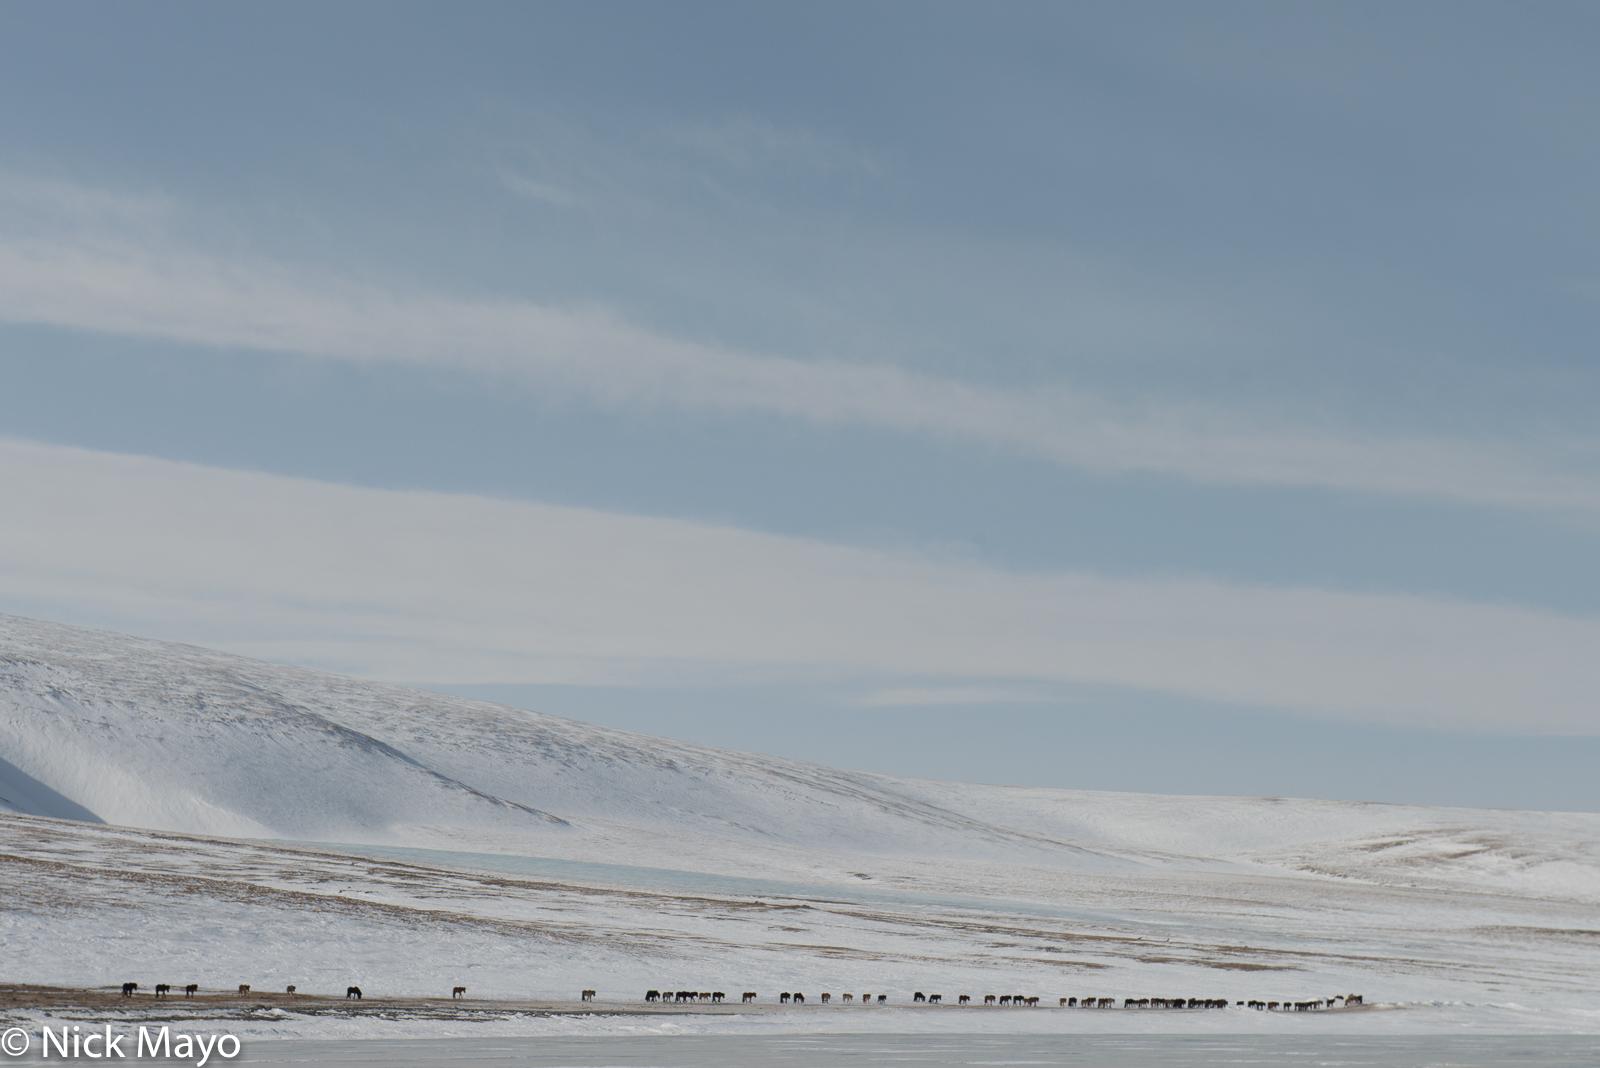 Bayan-Ölgii, Horse, Mongolia, photo